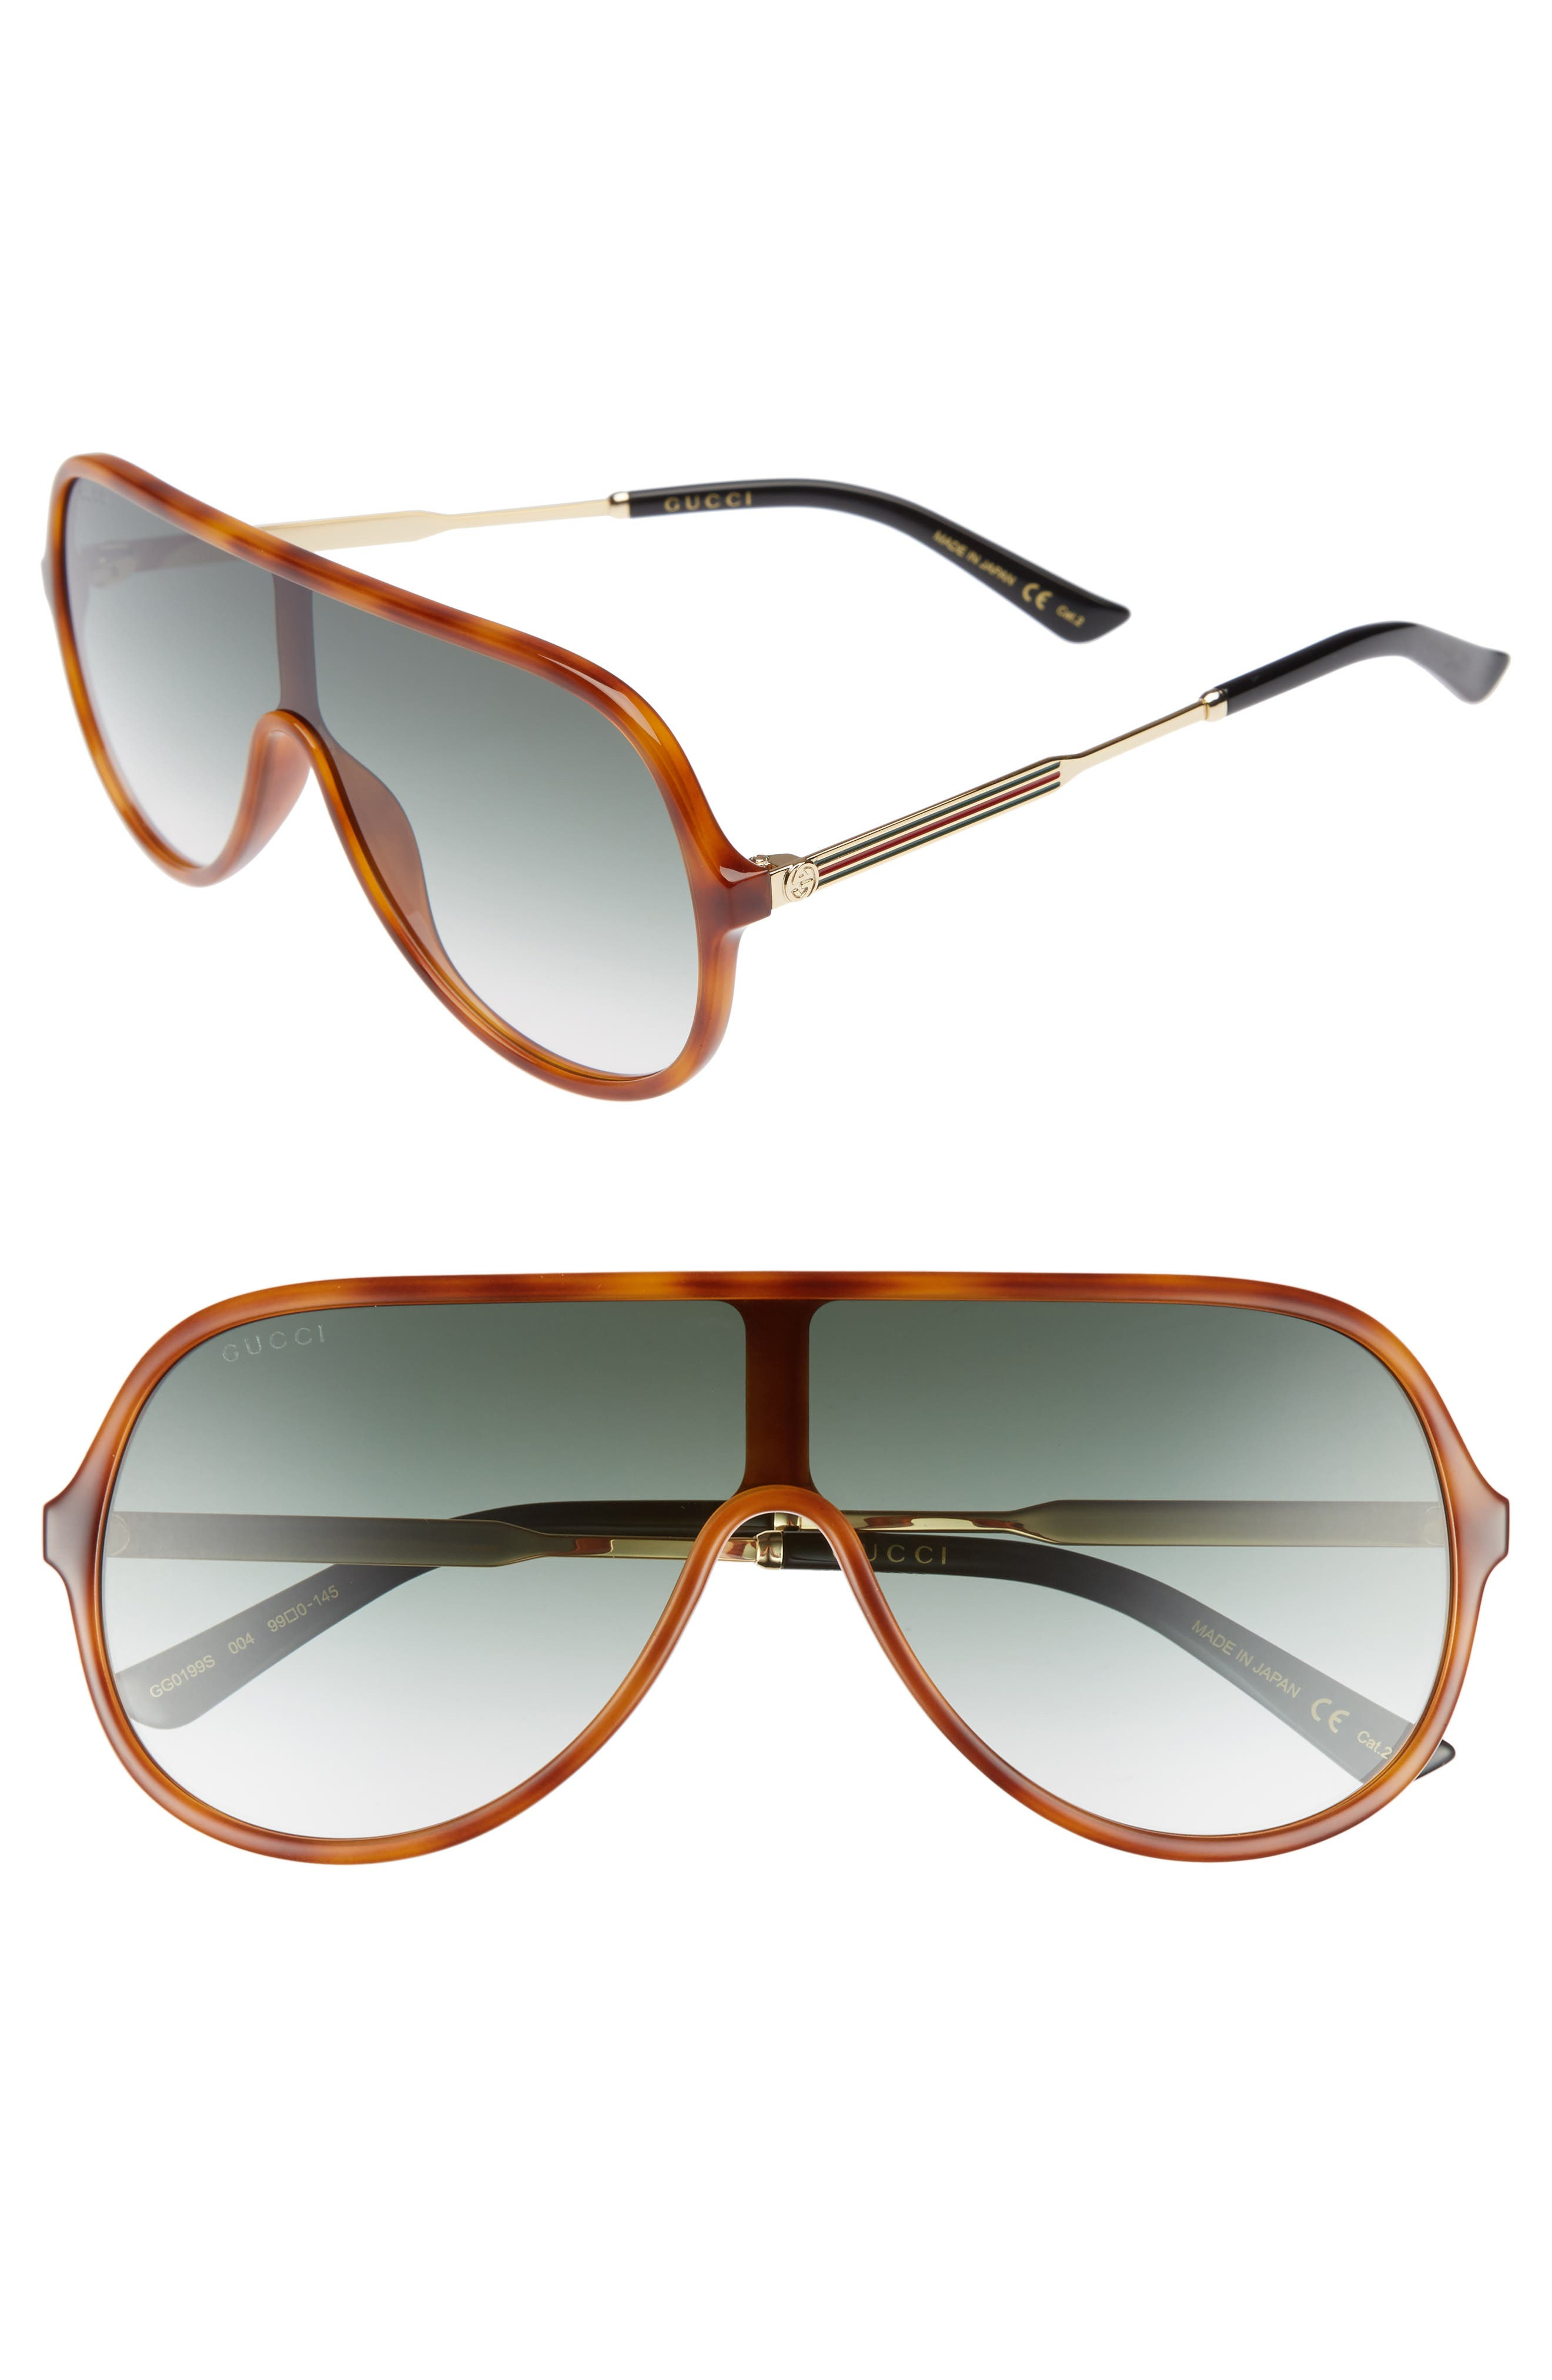 Alternate Image 1 Selected - Gucci 99mm Oversize Shield Sunglasses